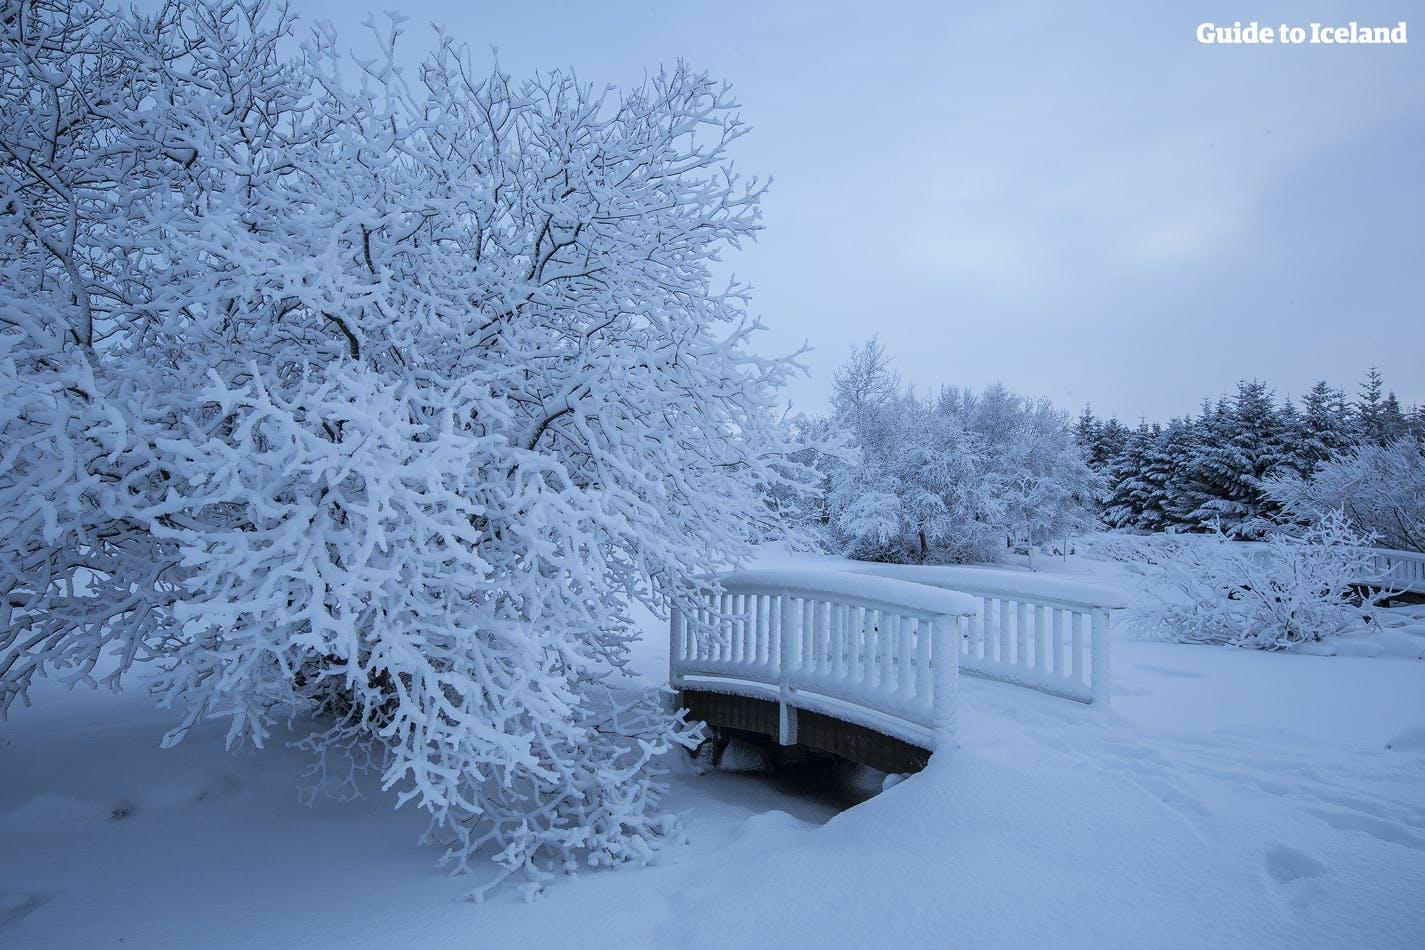 Snow-covered Reykjavík city in the winter.